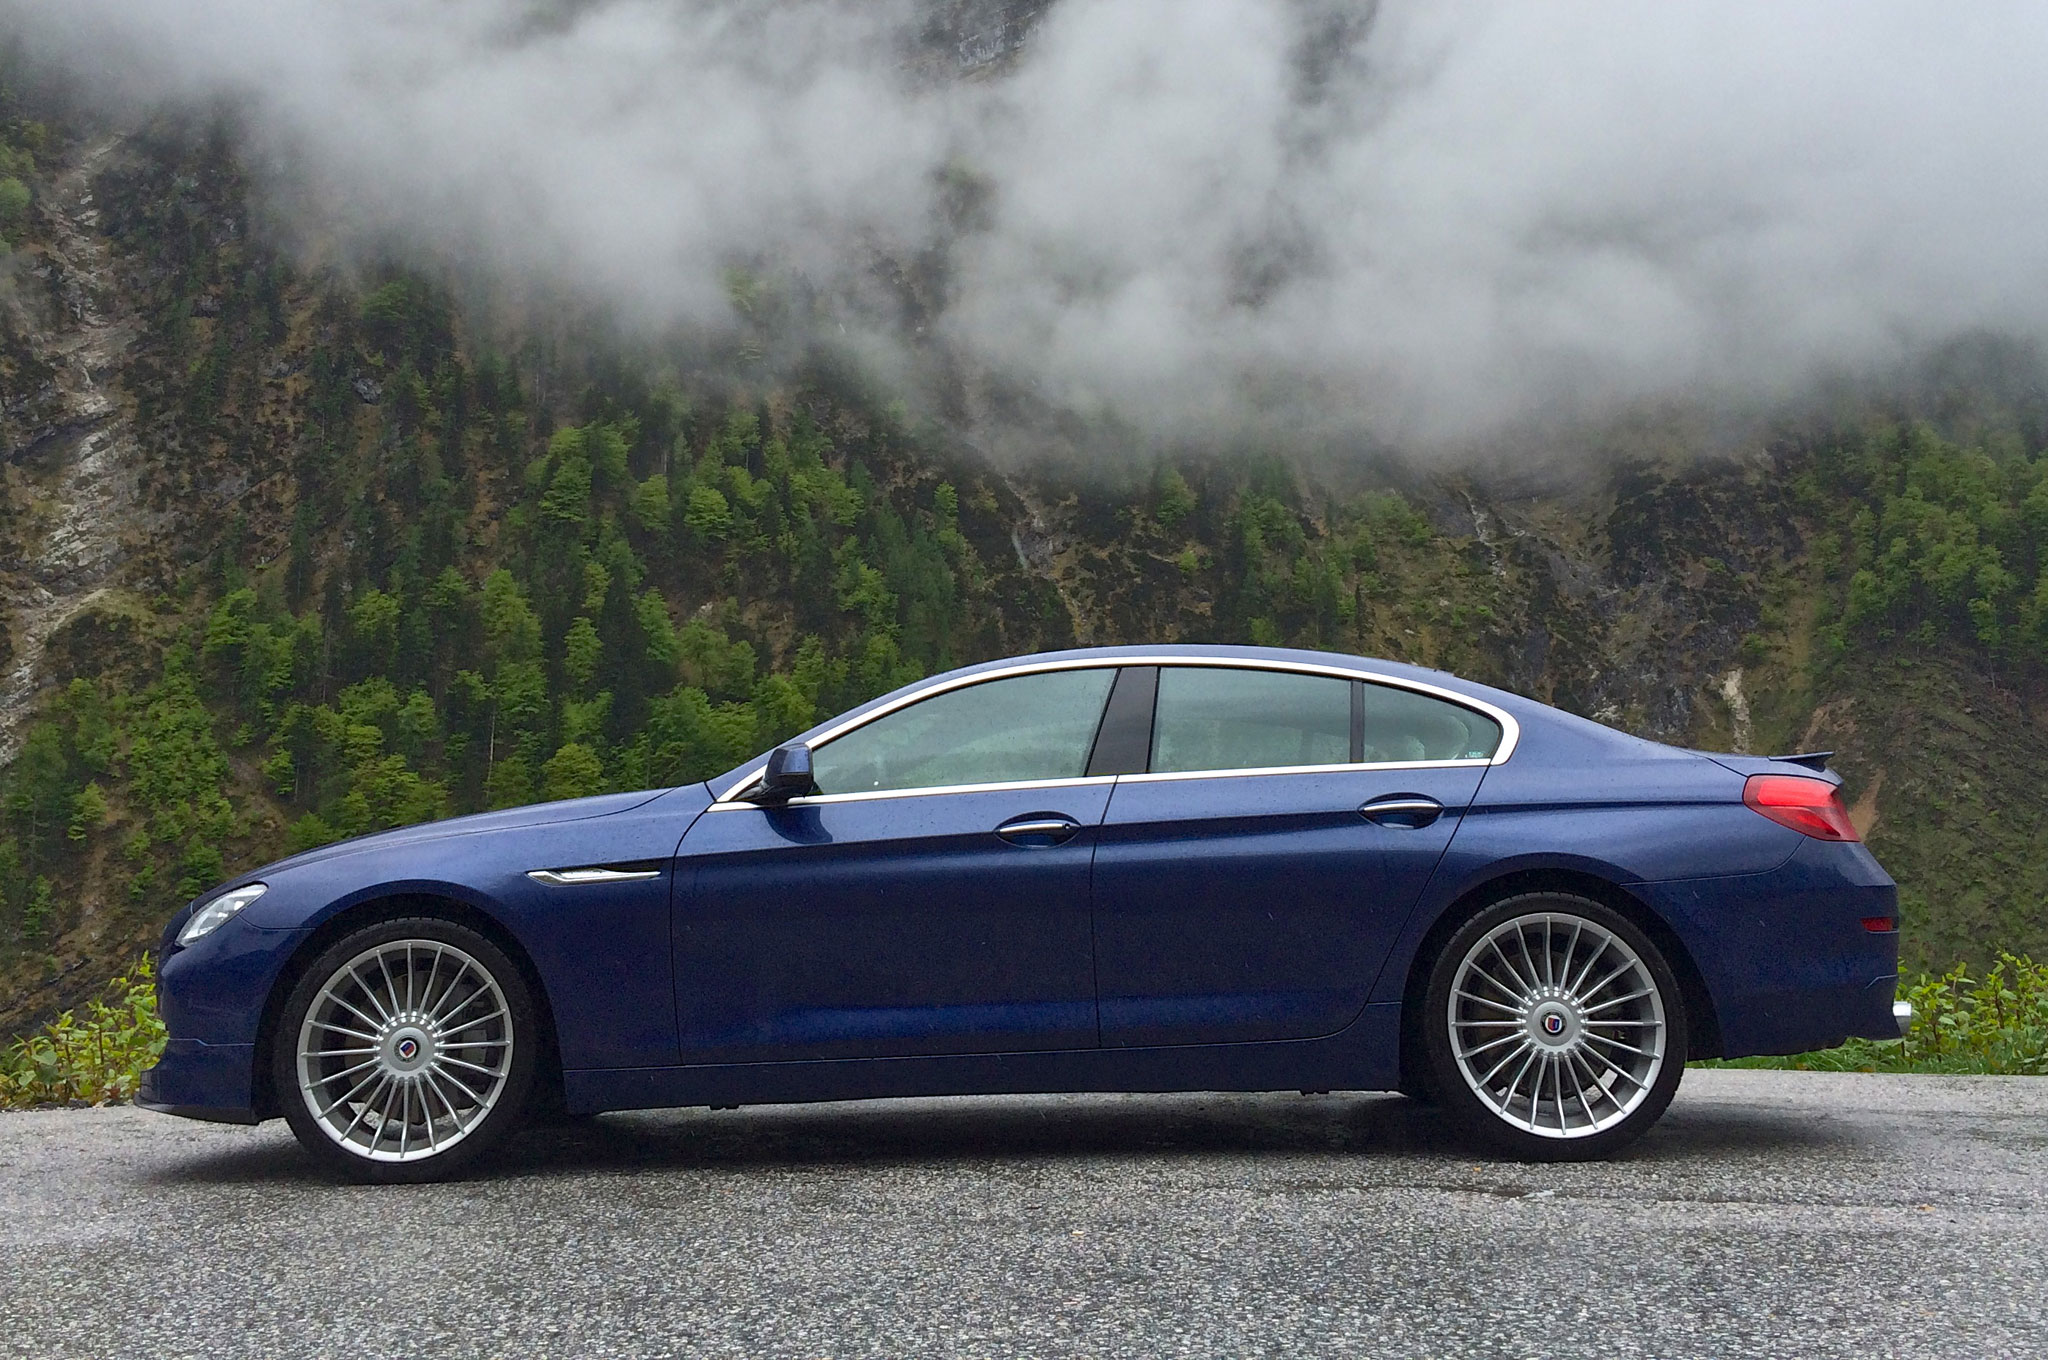 Bmw Alpina B6 >> 2015 BMW Alpina B6 xDrive Gran Coupe Review - Automobile Magazine